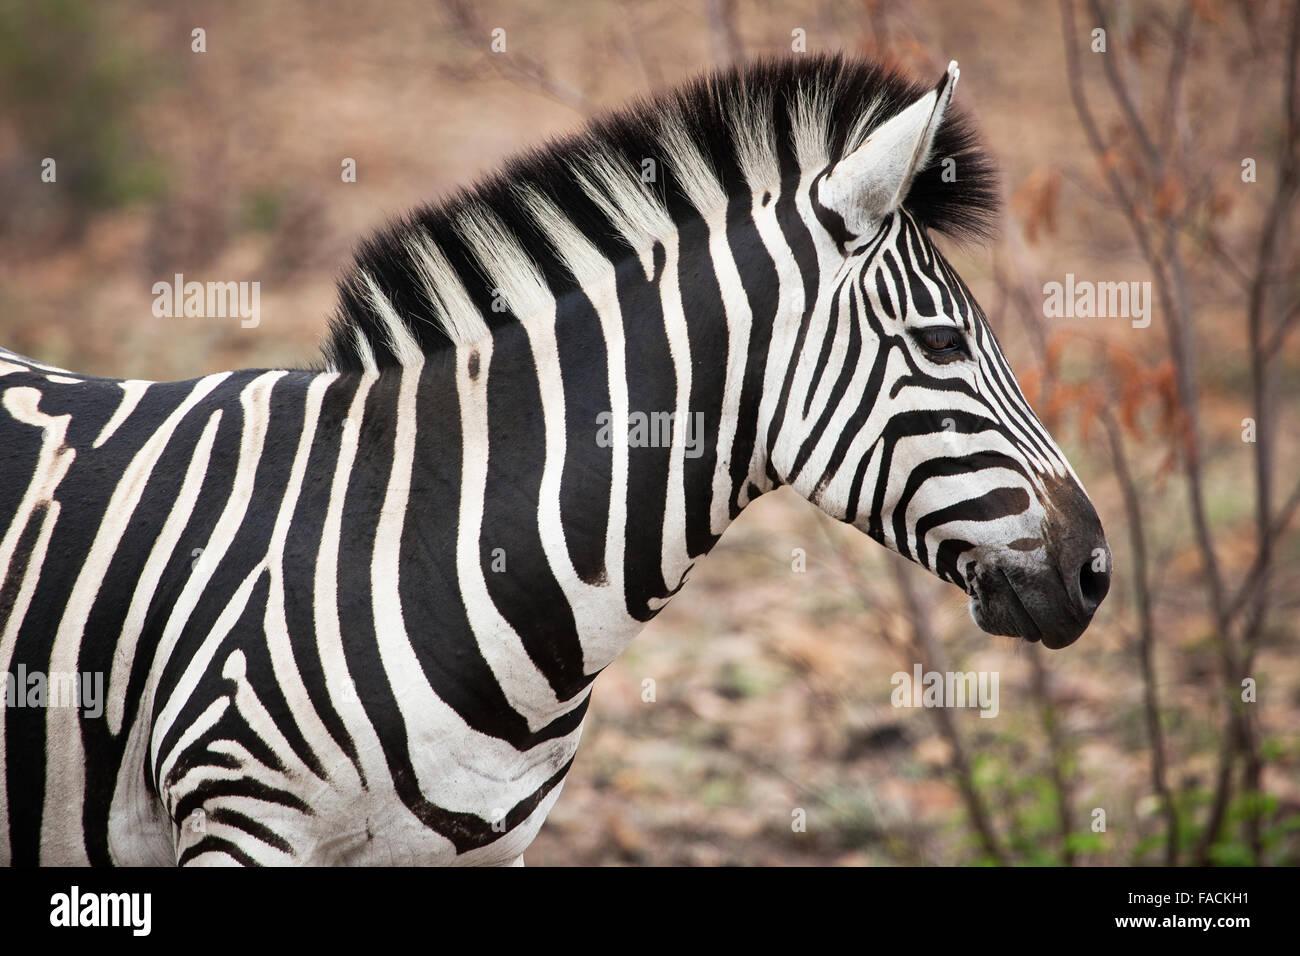 African Zebra closeup Photo Stock